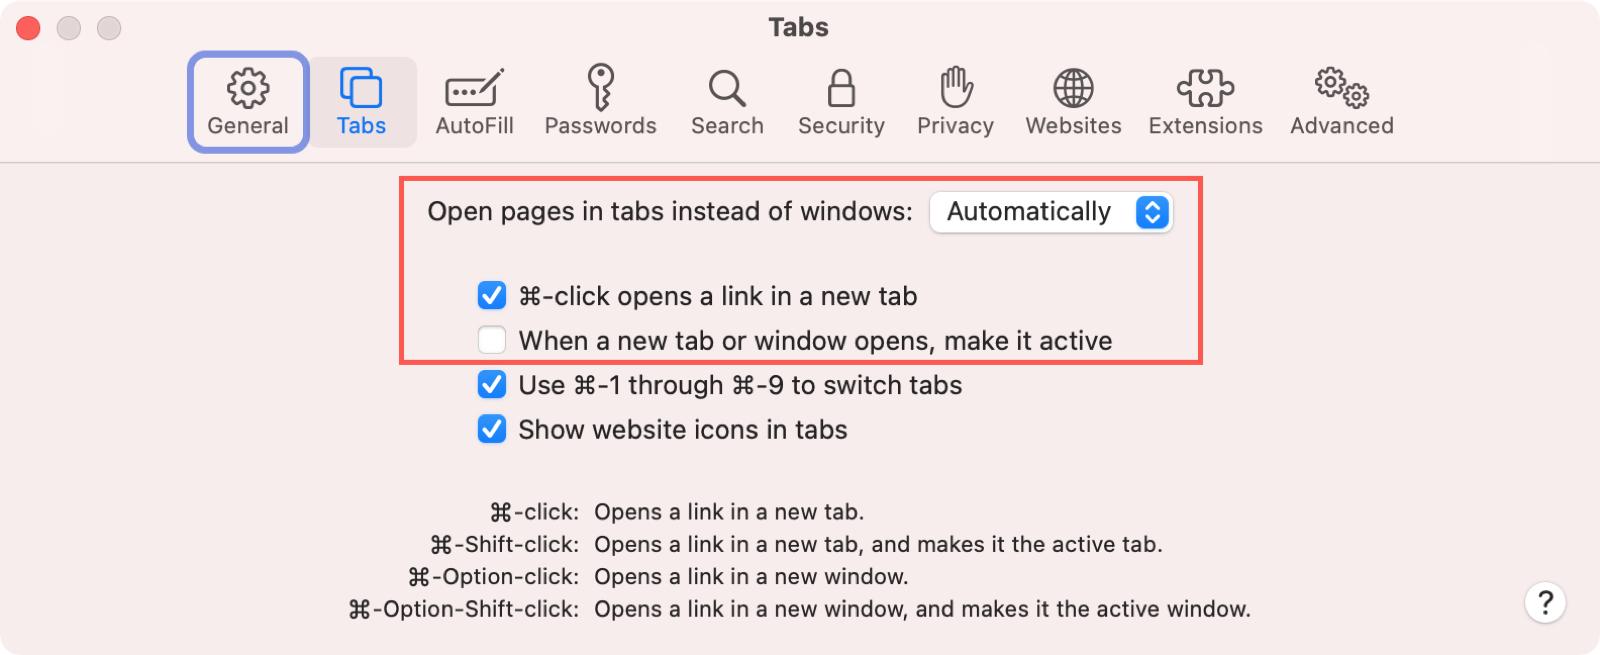 Safari New Tab Preferences on Mac